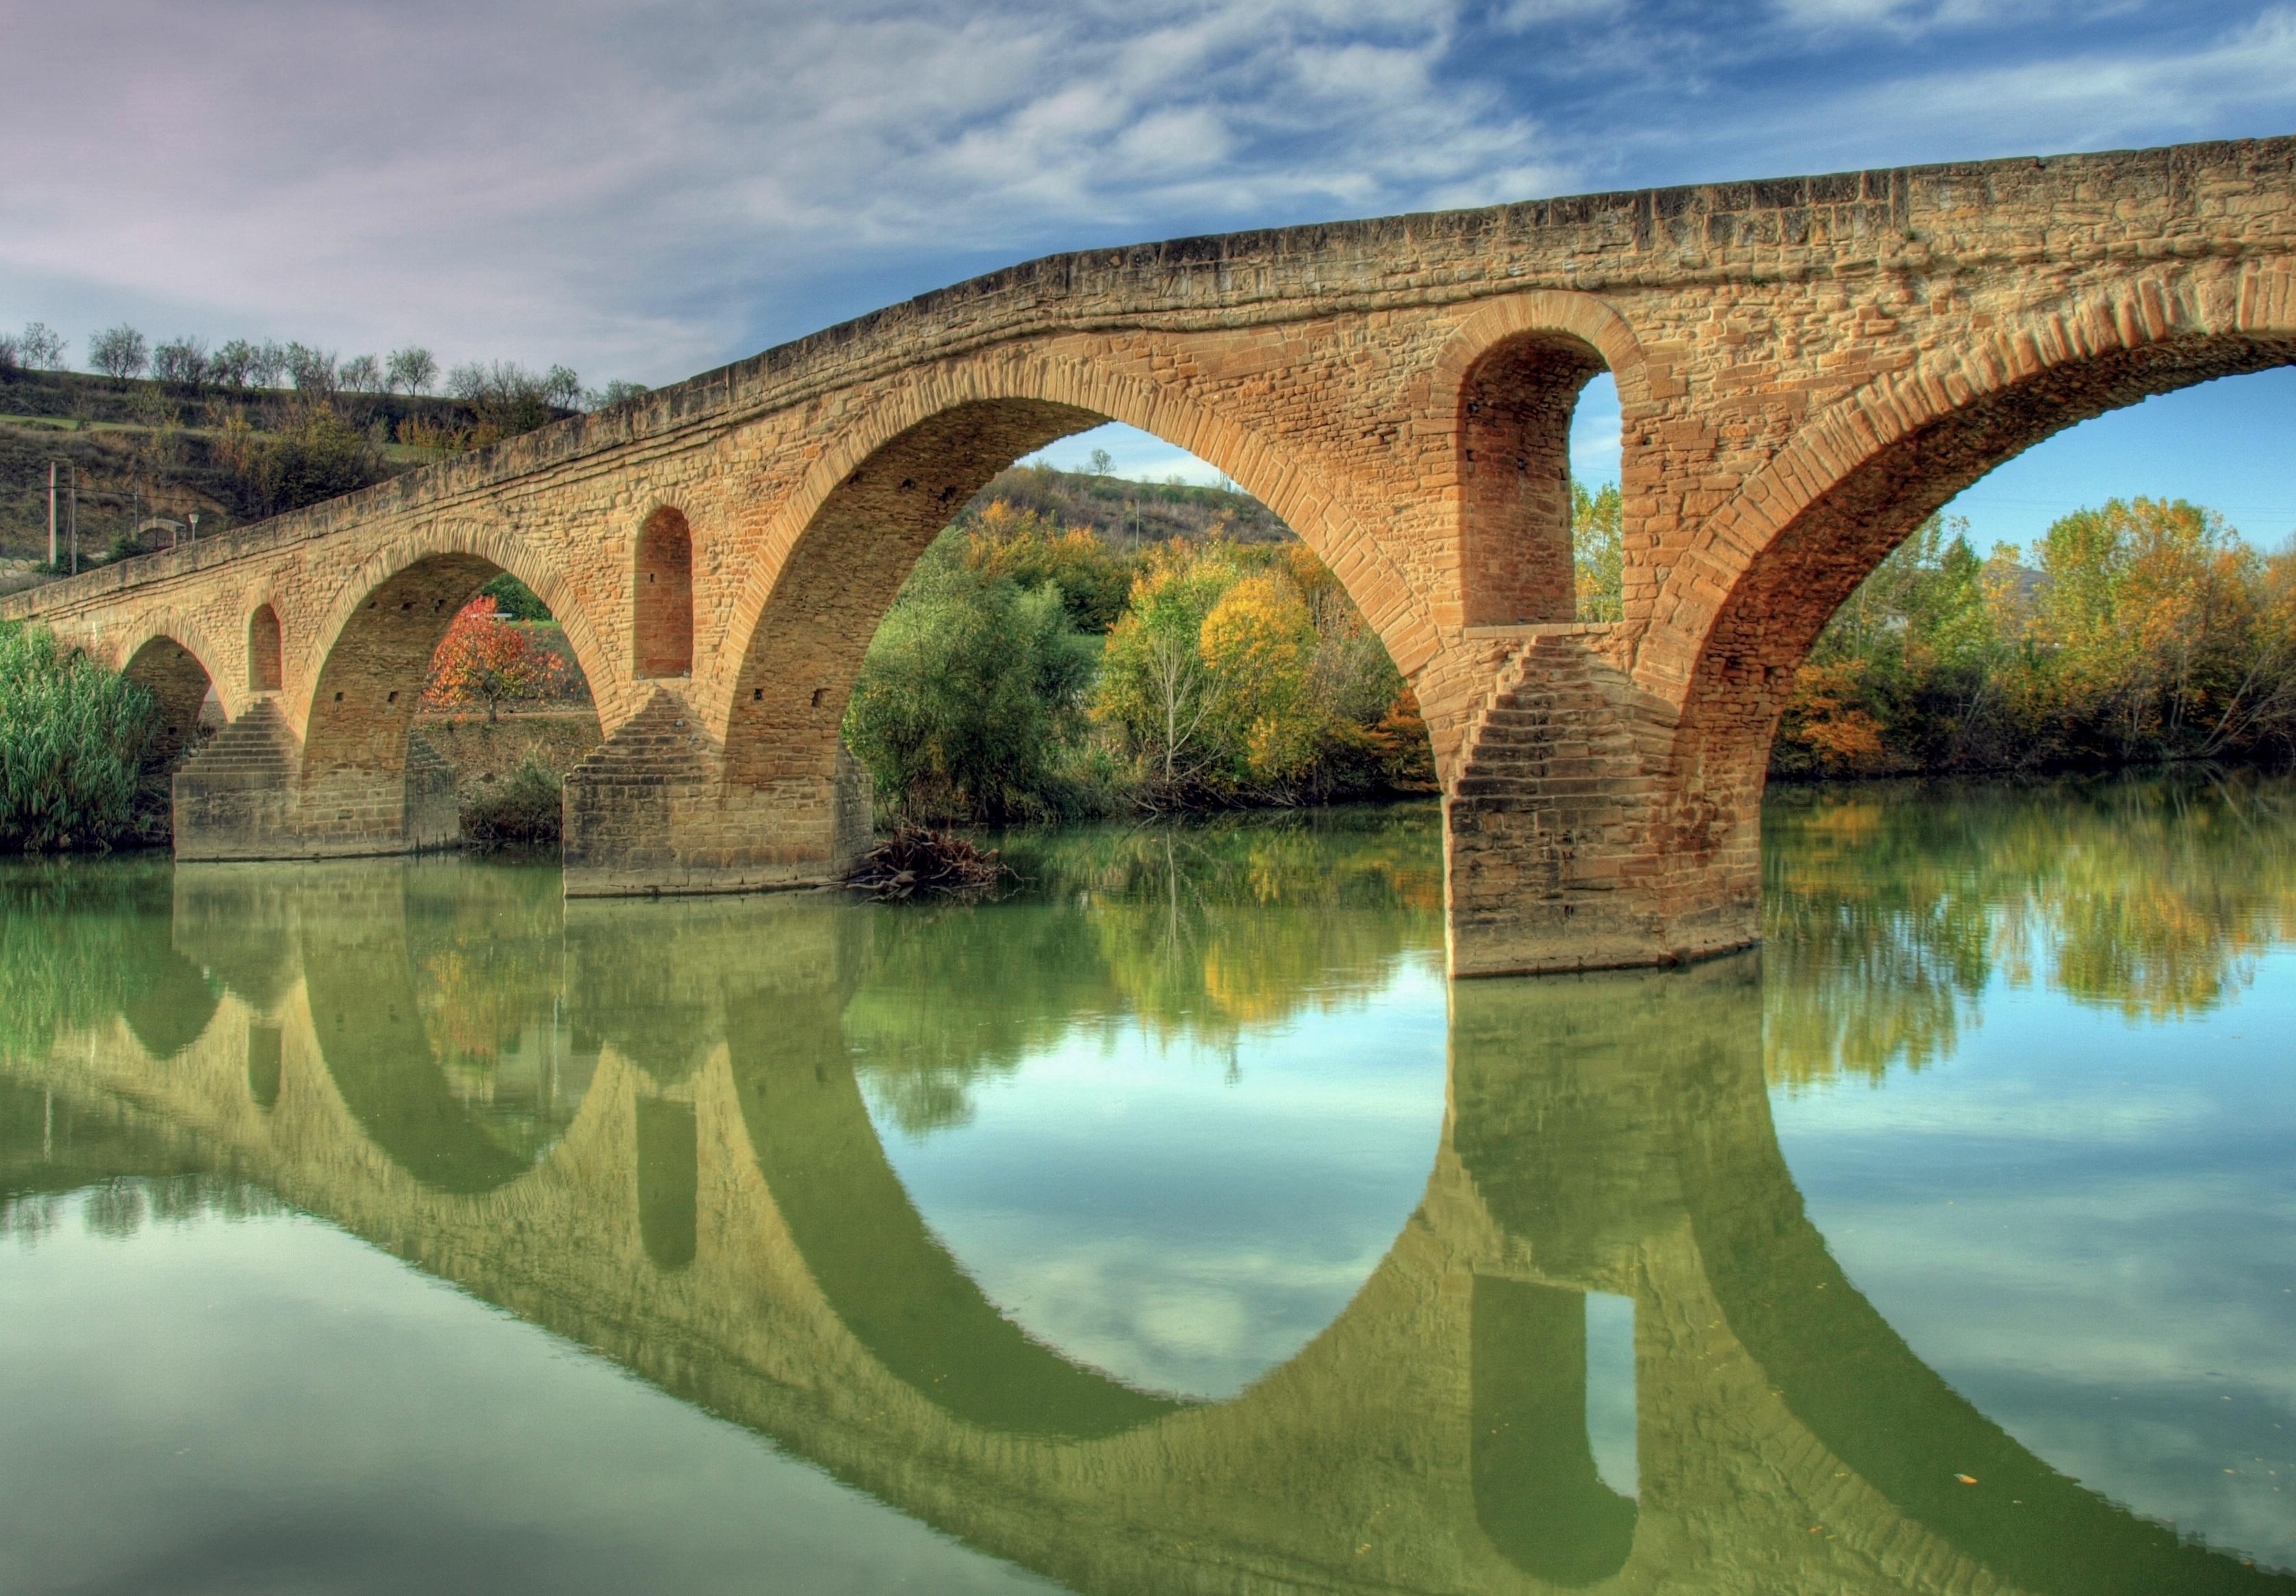 Puente la Reina © aherrero